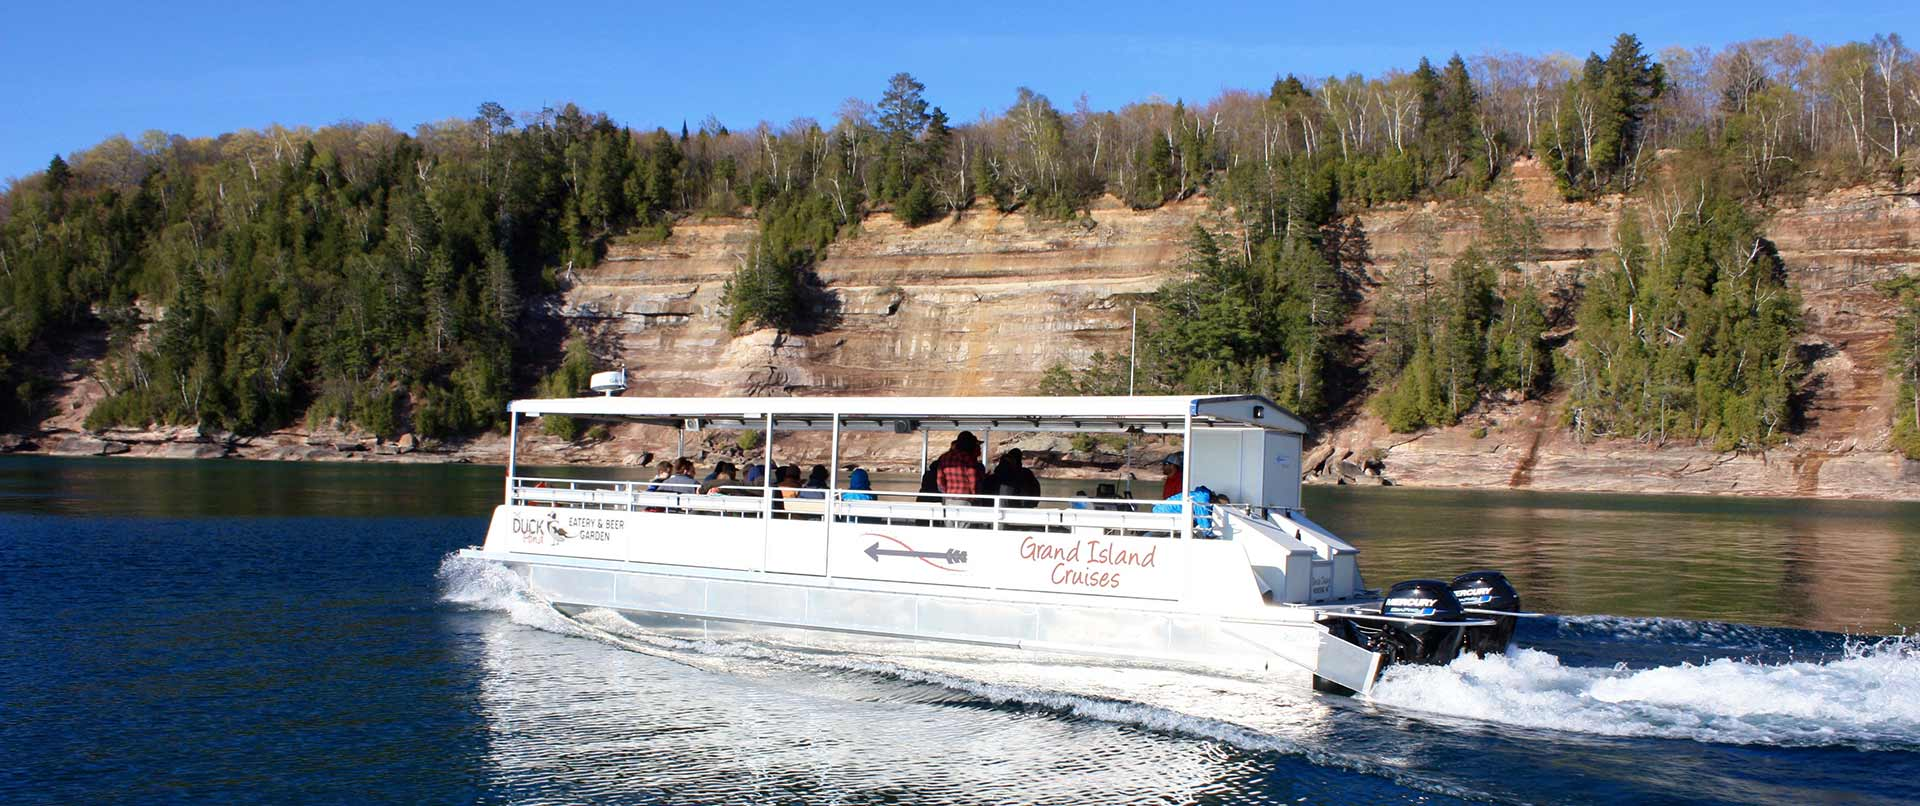 grand-island-cruises-banner